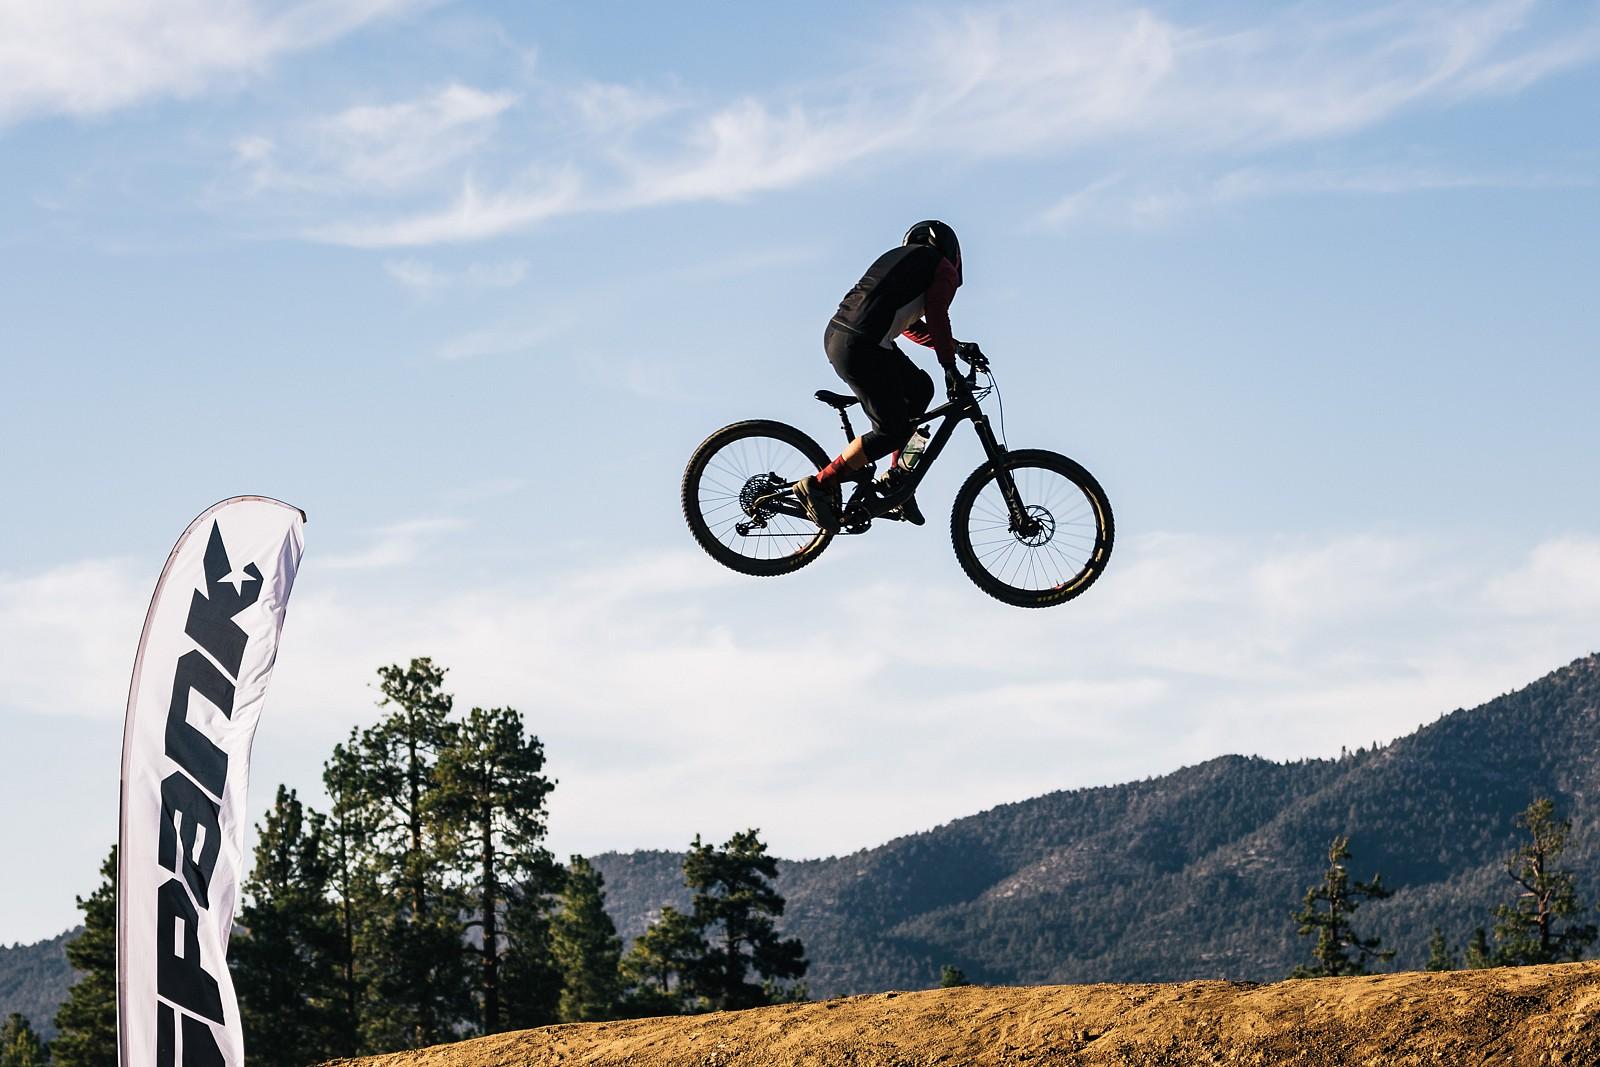 2019USOpenMTBWhip yellow-4 - ALeedomPhotography - Mountain Biking Pictures - Vital MTB